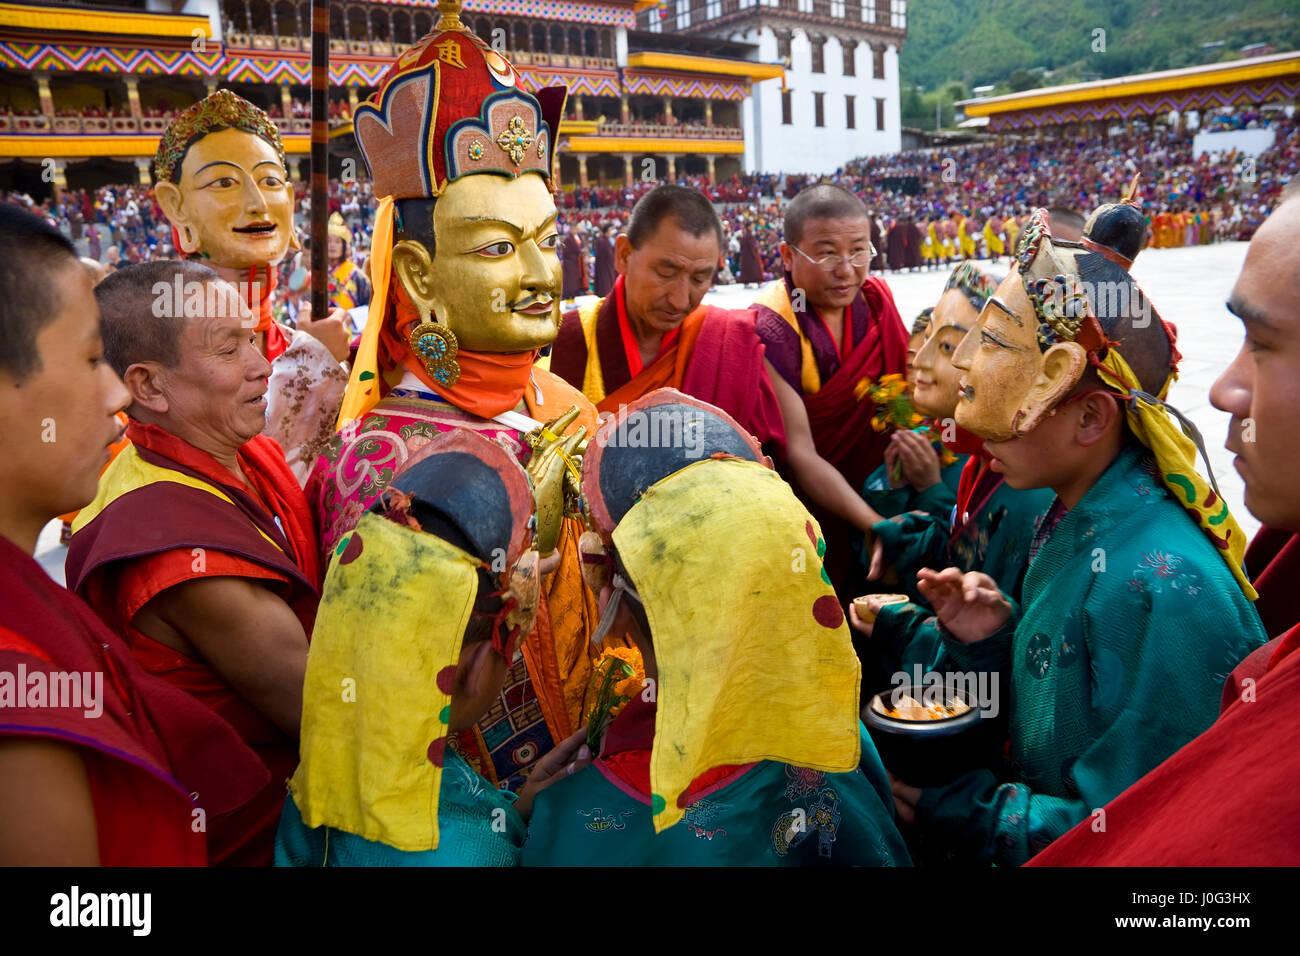 Masque en cours passé foule, Festival, Trashichhoe Dzong, monastère, Thimphu, Bhoutan Photo Stock